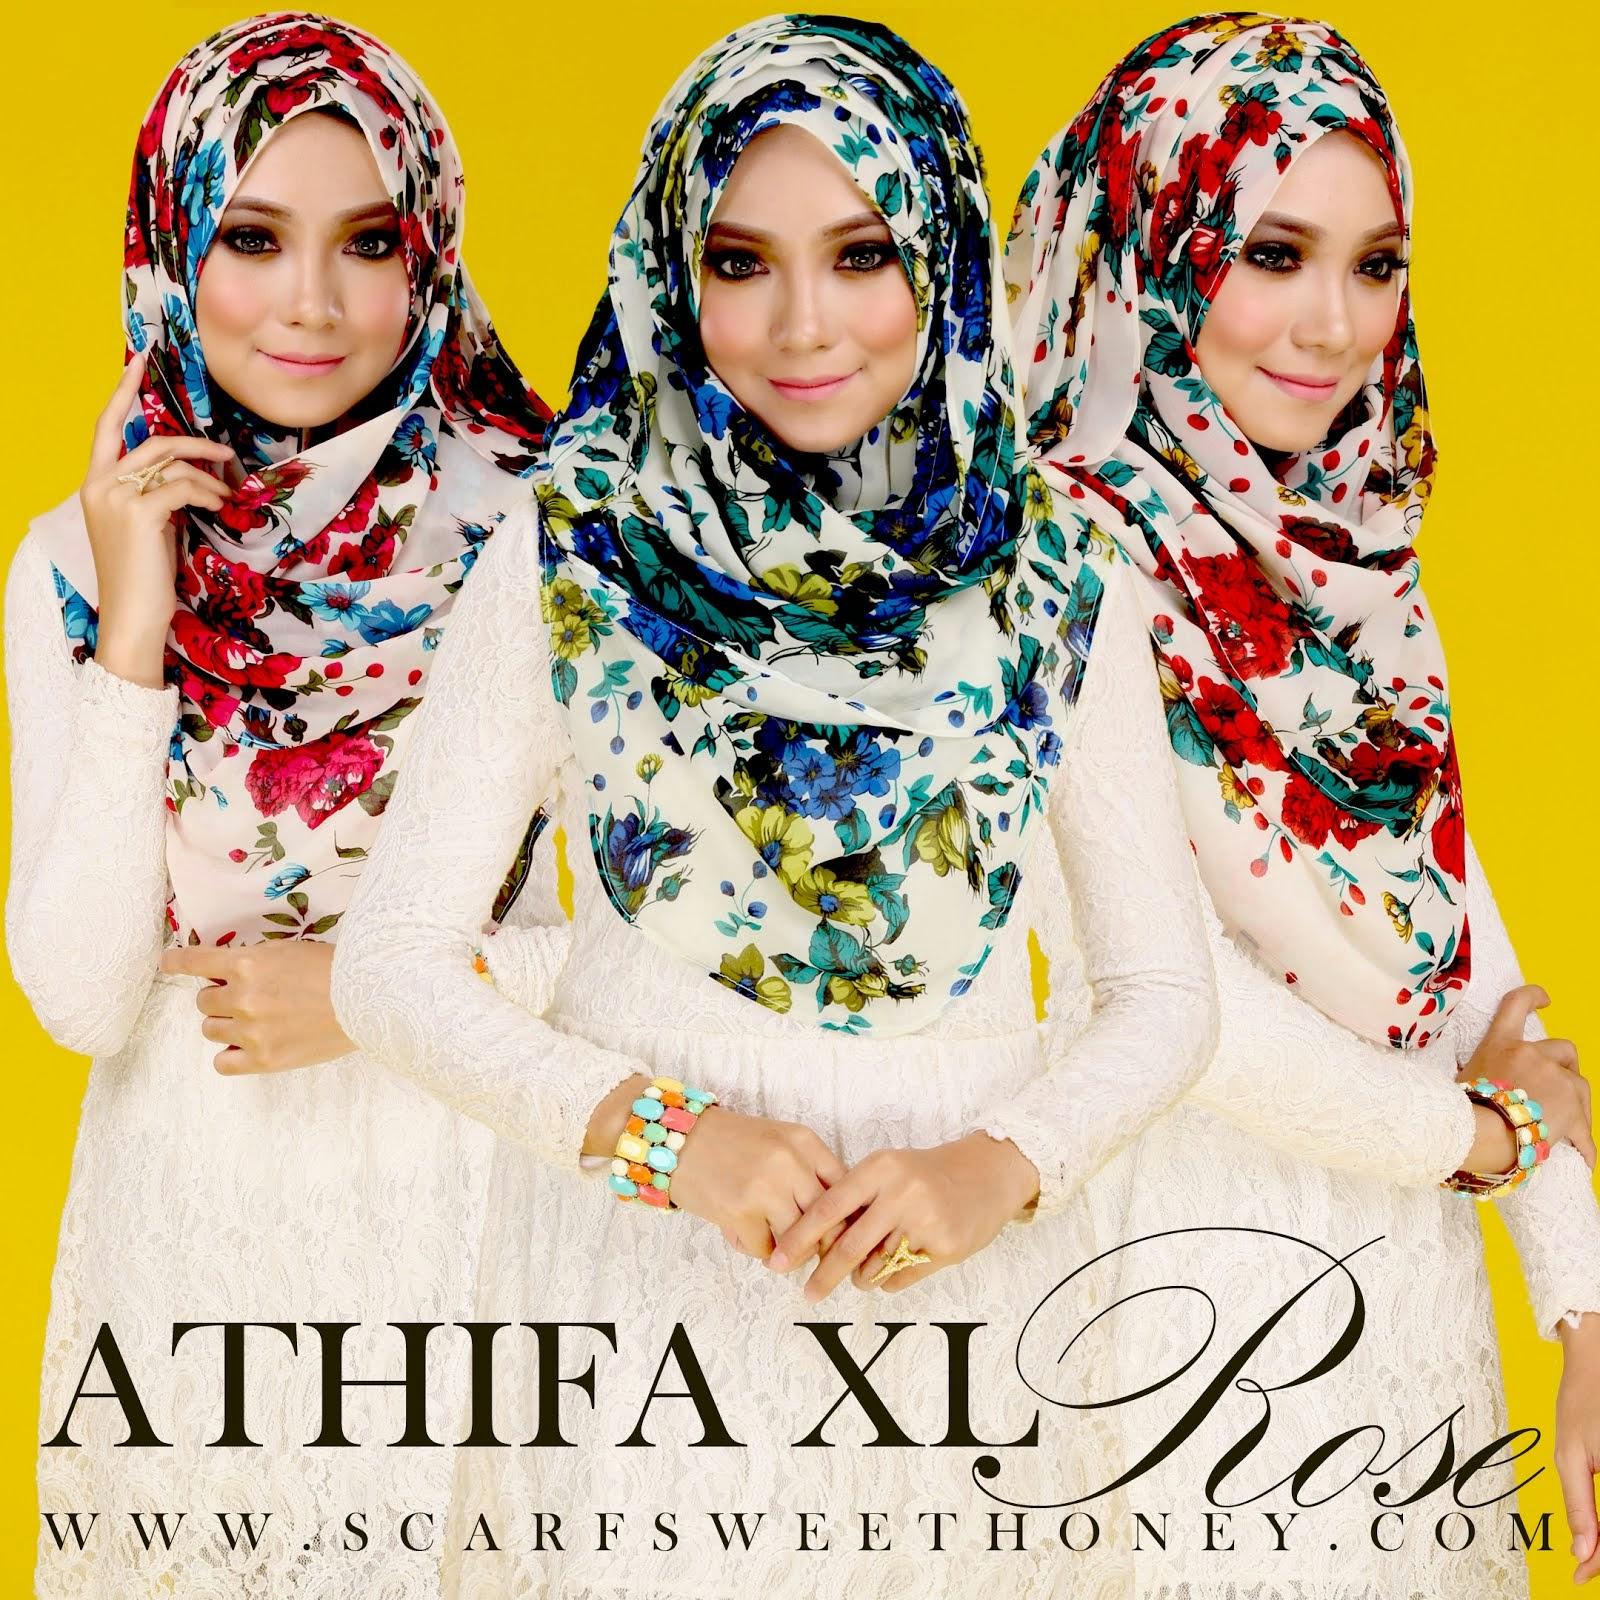 ATHIFA Rose